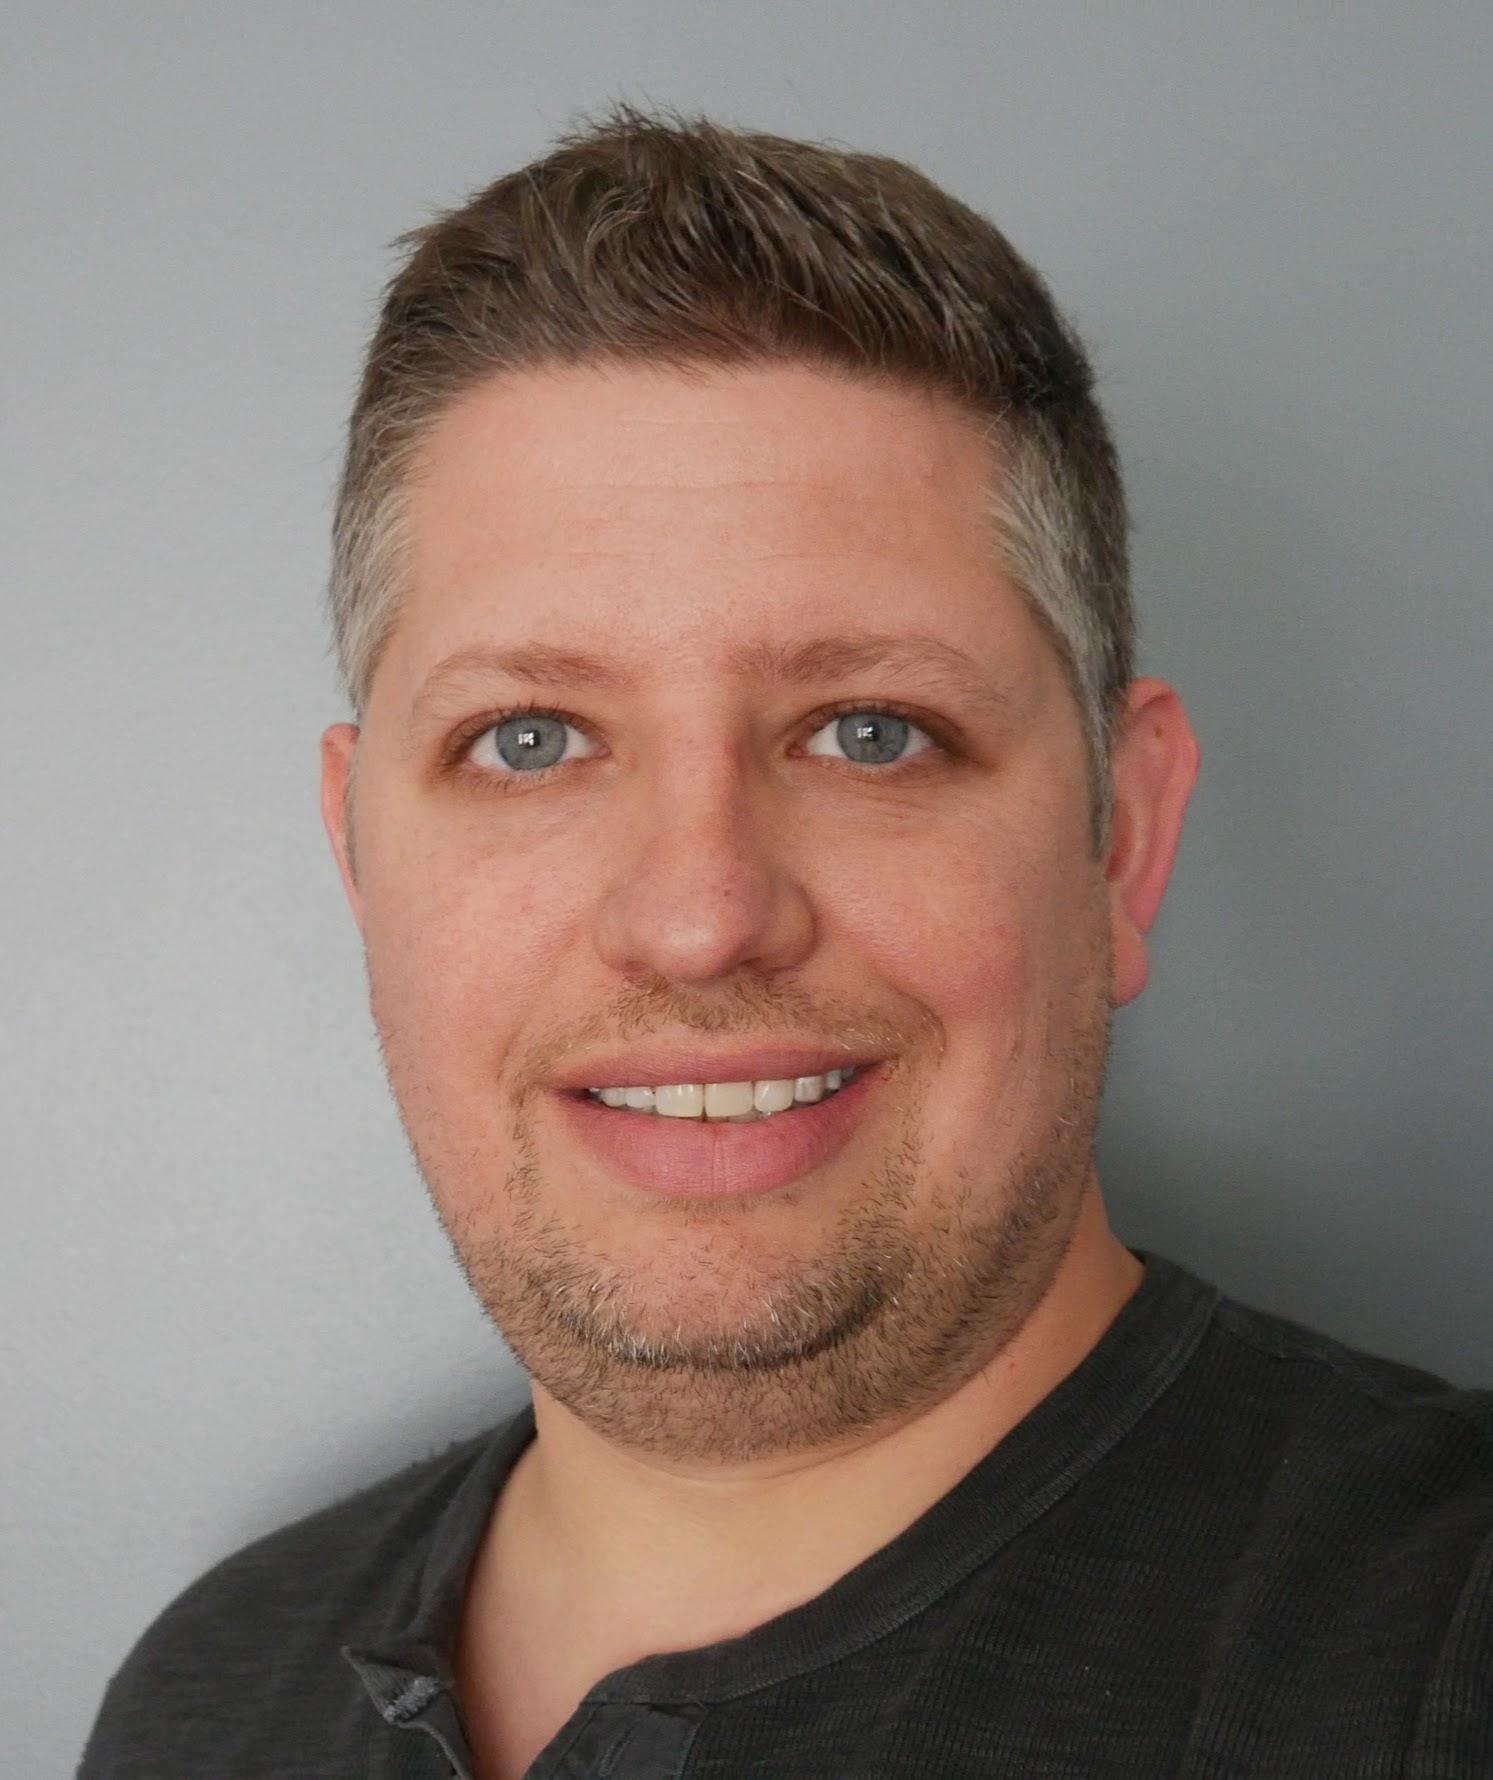 Daniel Affourtit